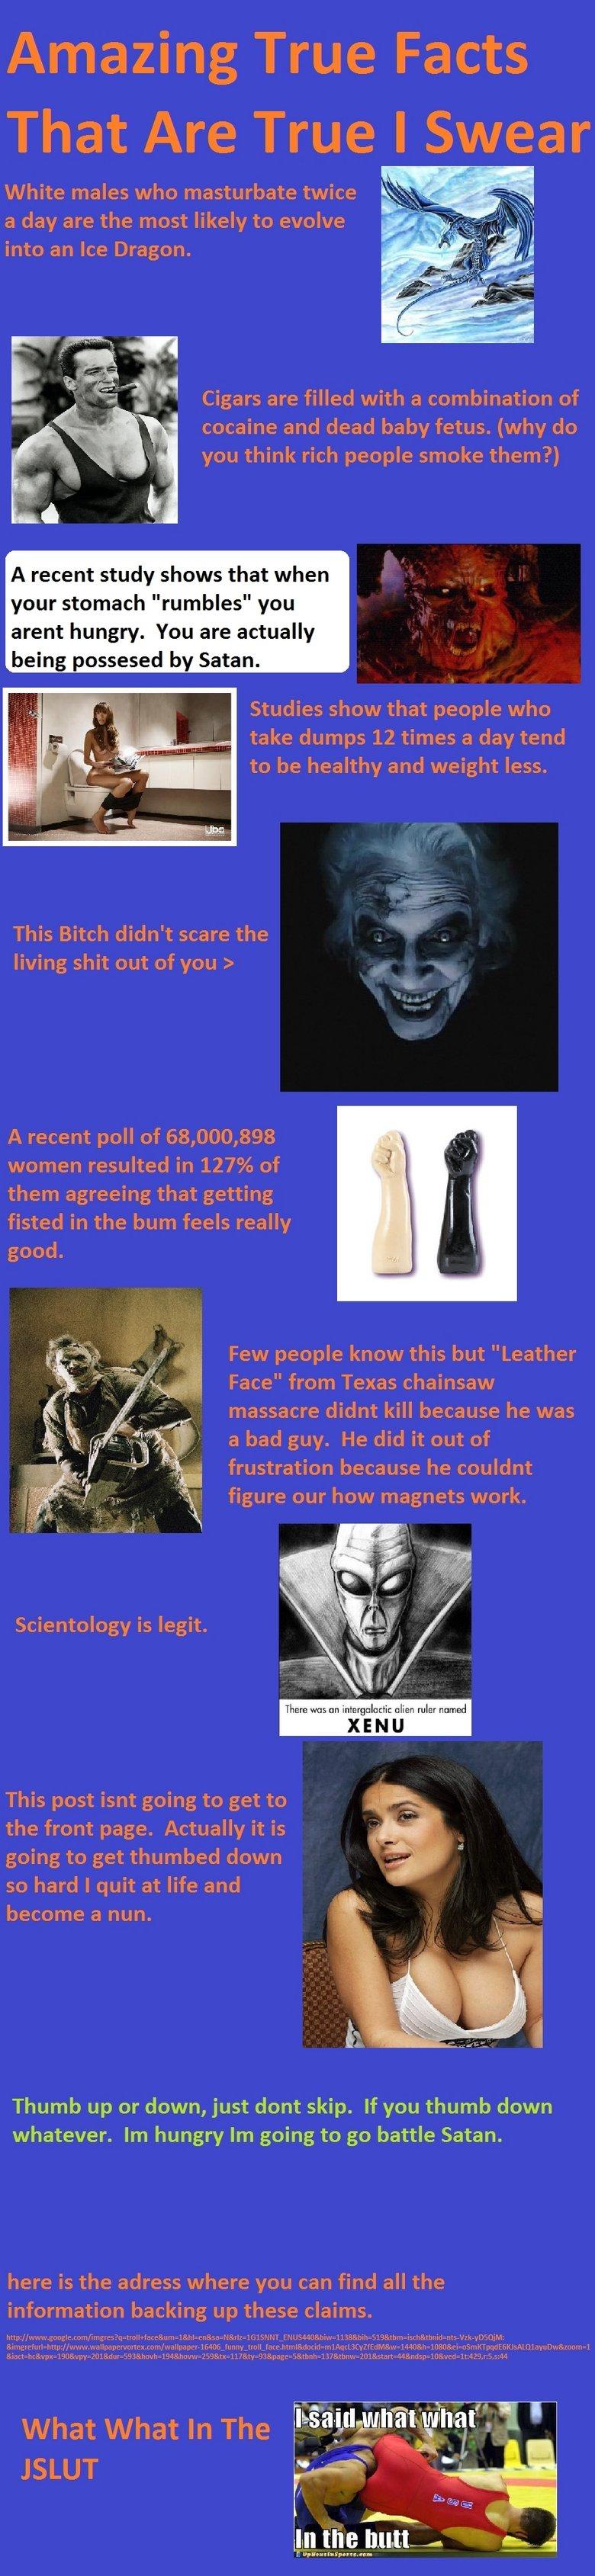 Amazing True Facts Comp 1. part 2:funnyjunk.com/funny_pictures/2691901/Amazing+True+Facts+Comp+2/ Part 3: funnyjunk.com/funny_pictures/2693945/Amazing+True+Fact